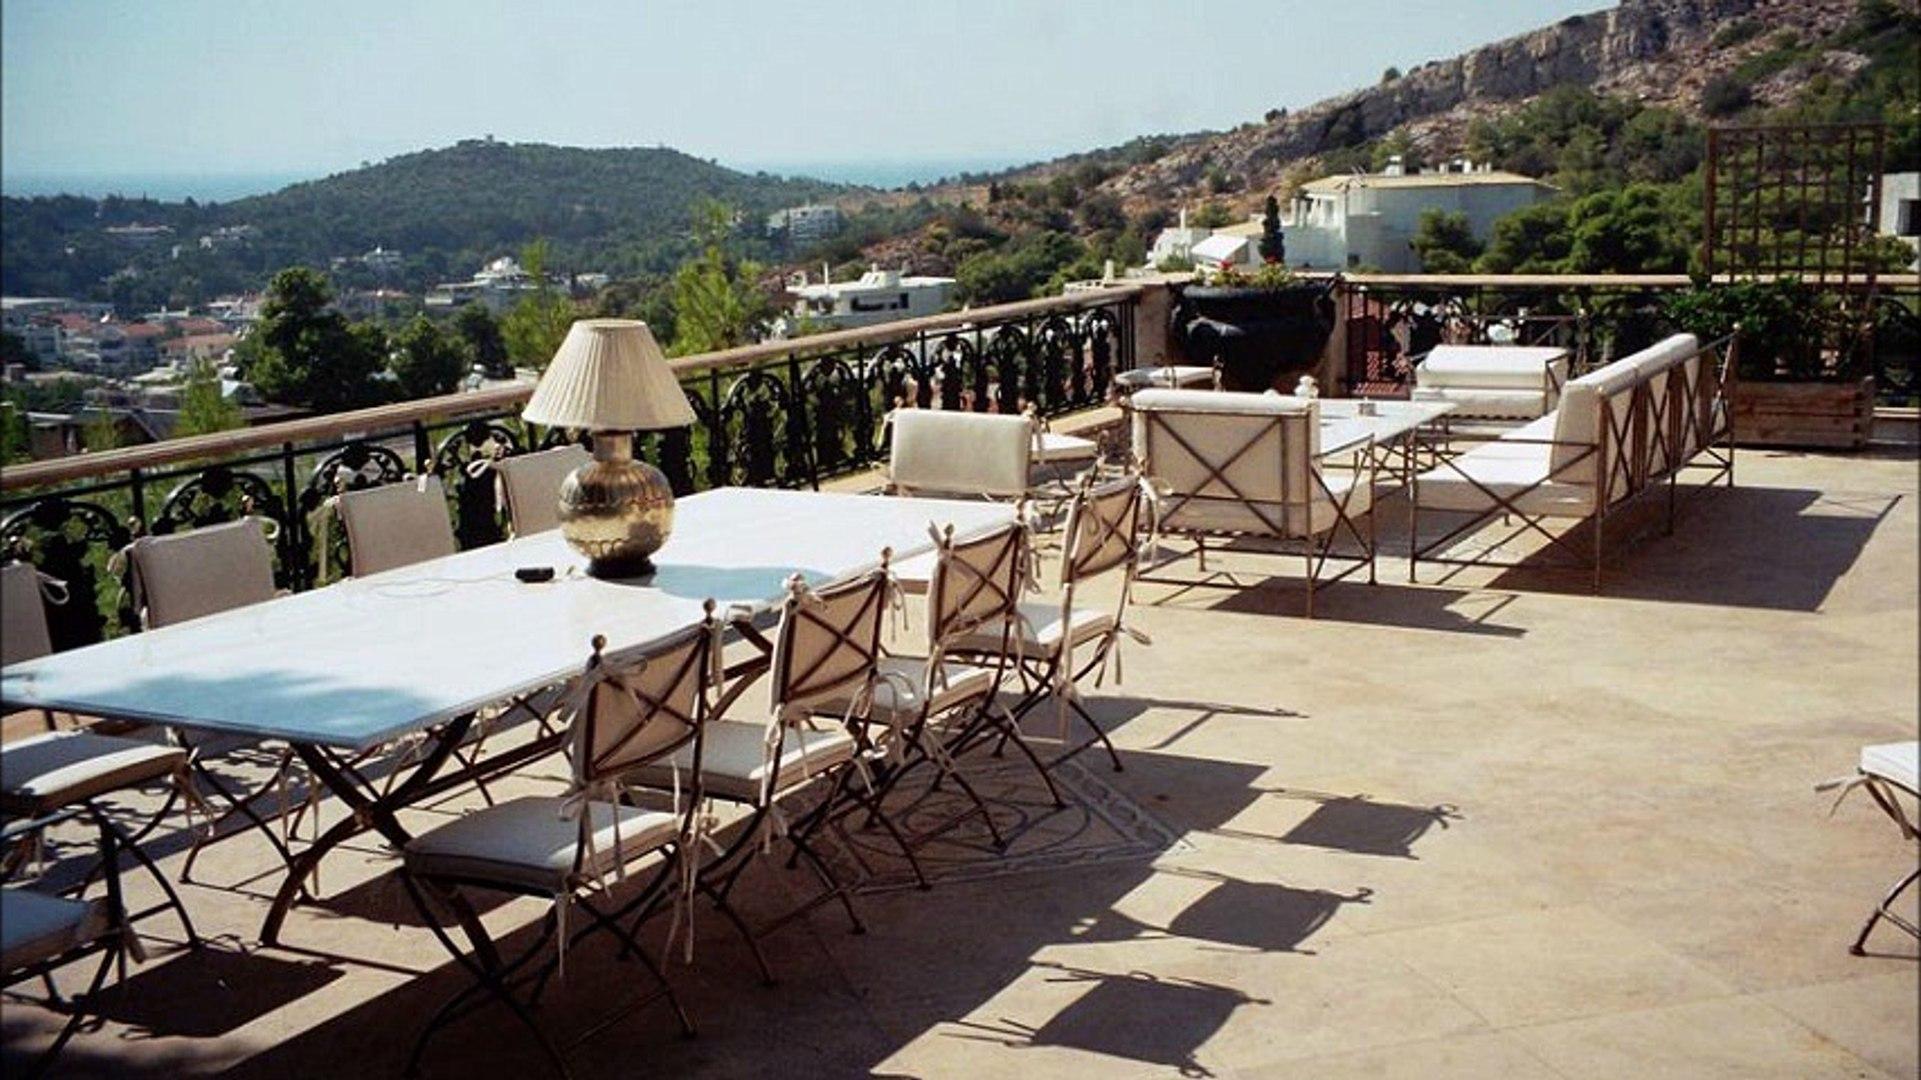 Garden furniture Ayia varvara Greece www.irony.gr Έπιπλα κήπου Αγία Βαρβάρα The Best Garden furnitur